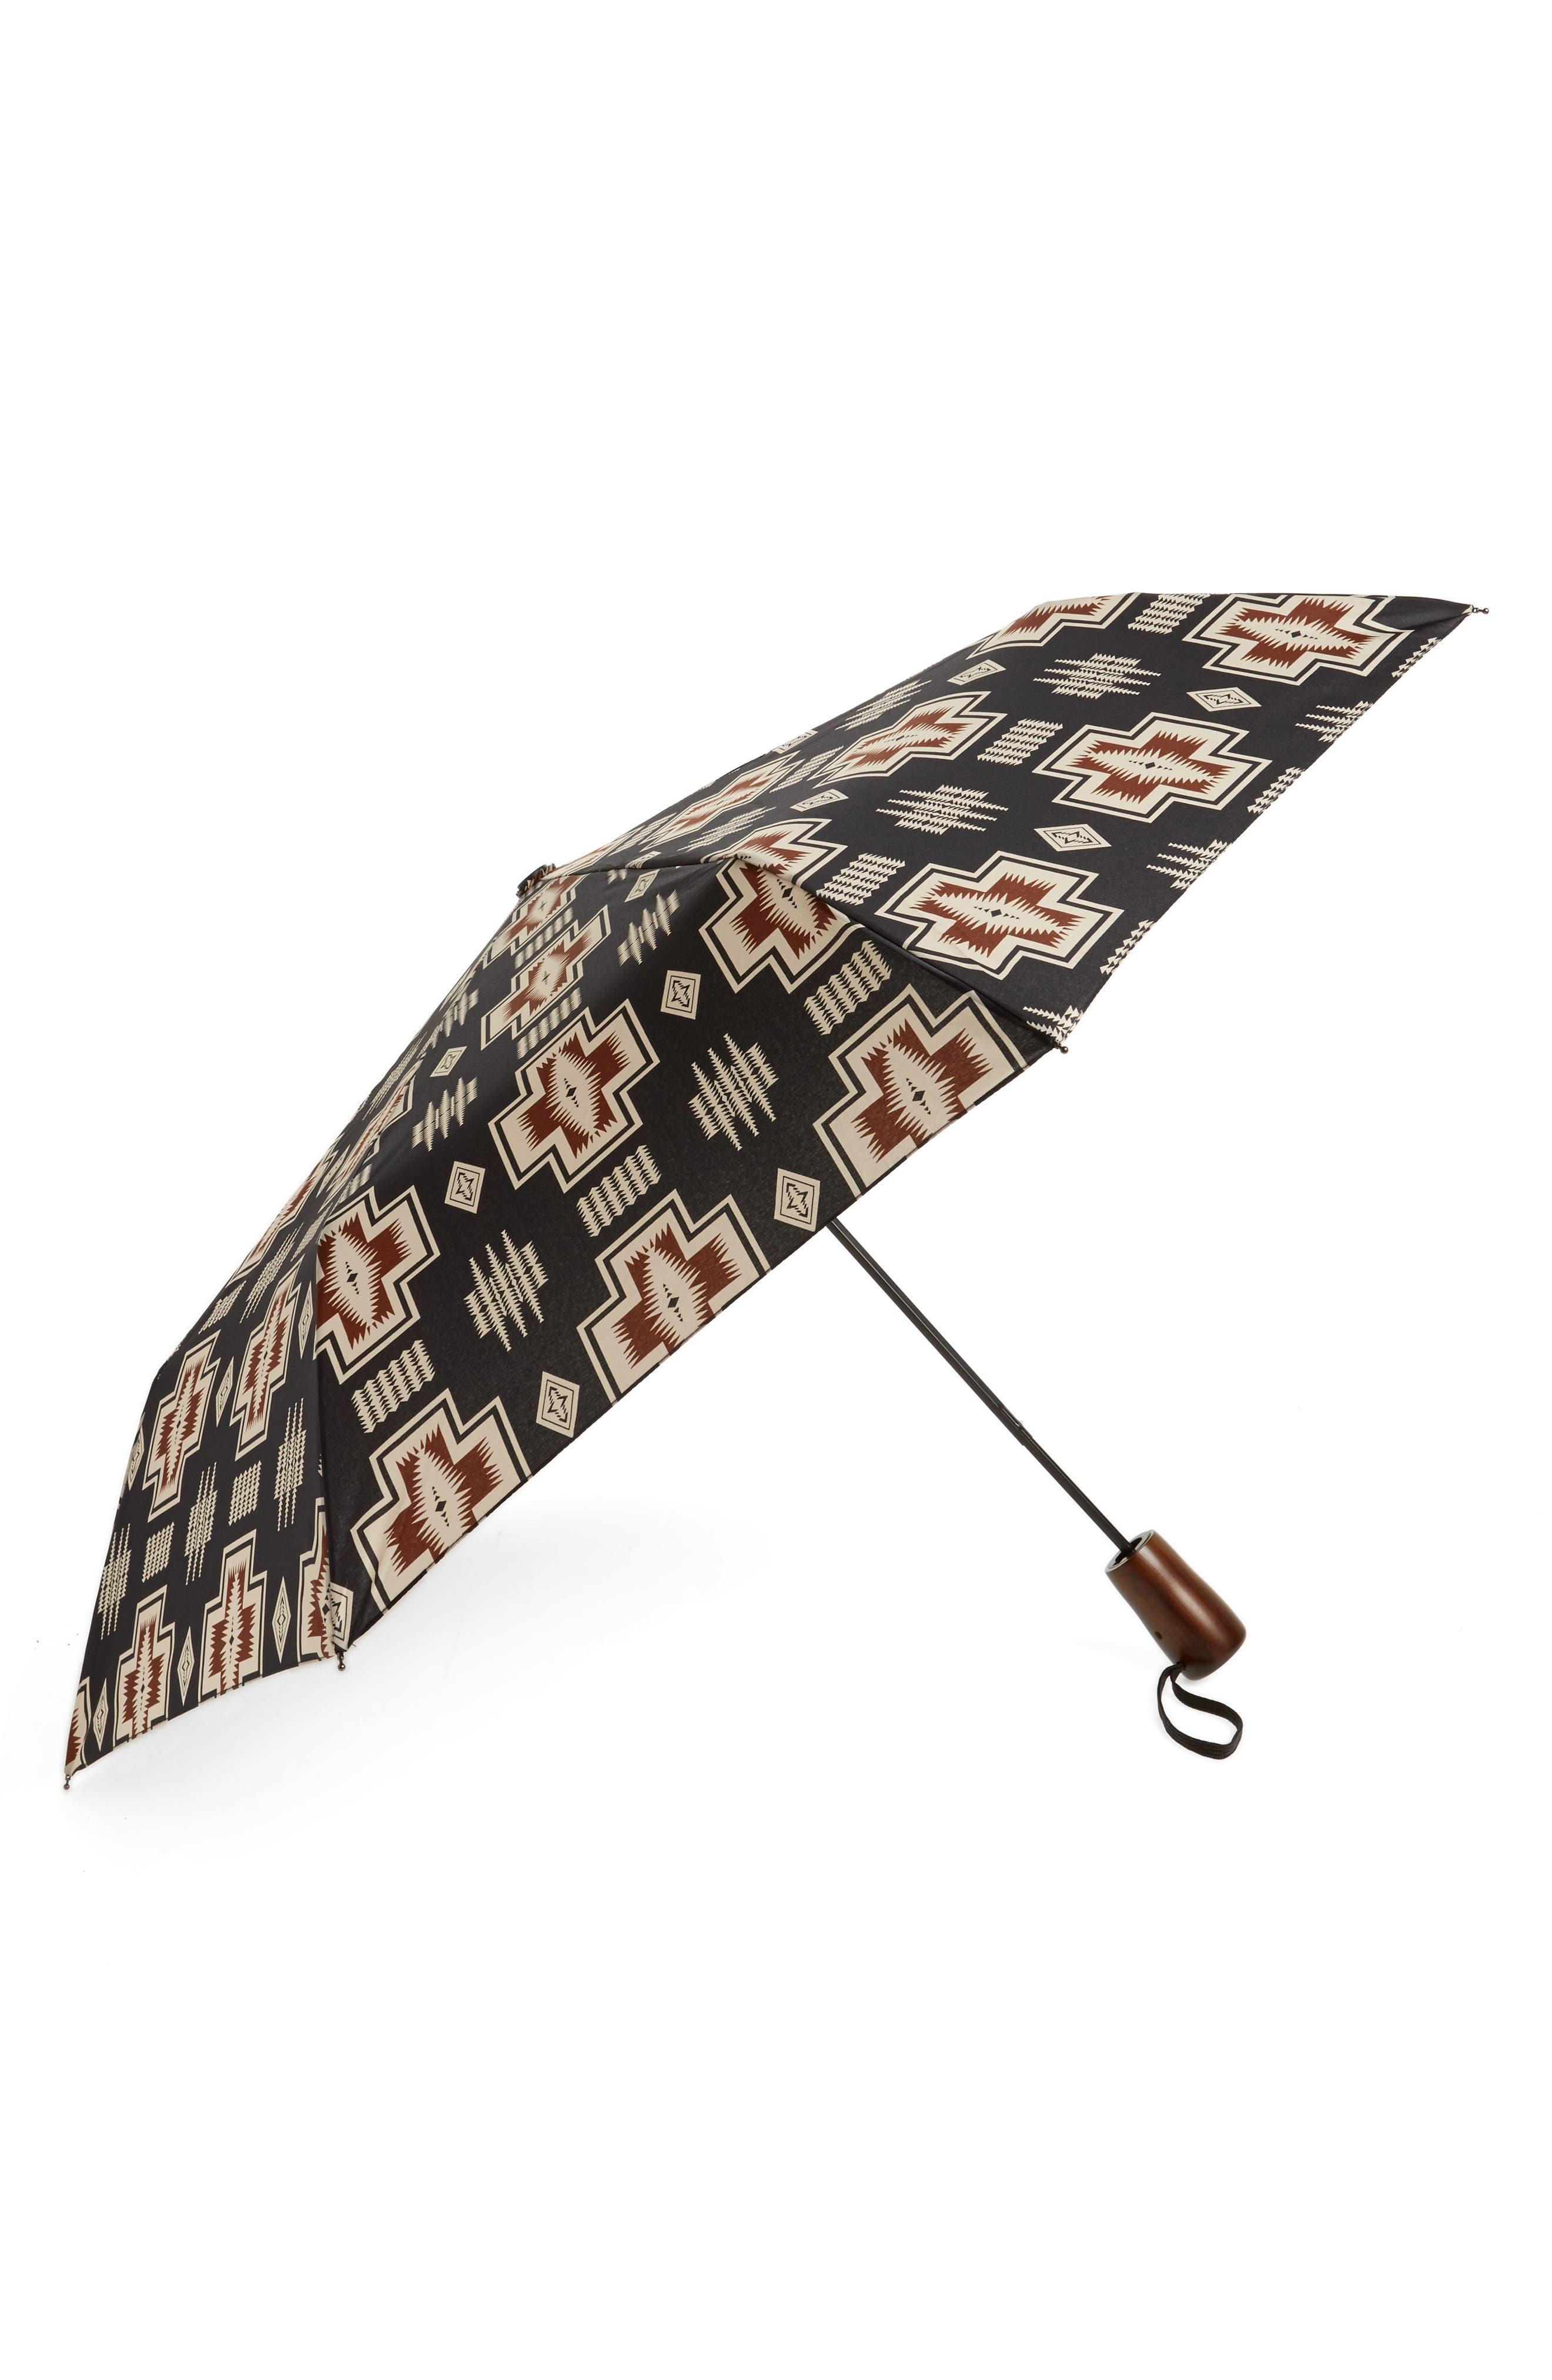 Pendleton Umbrella